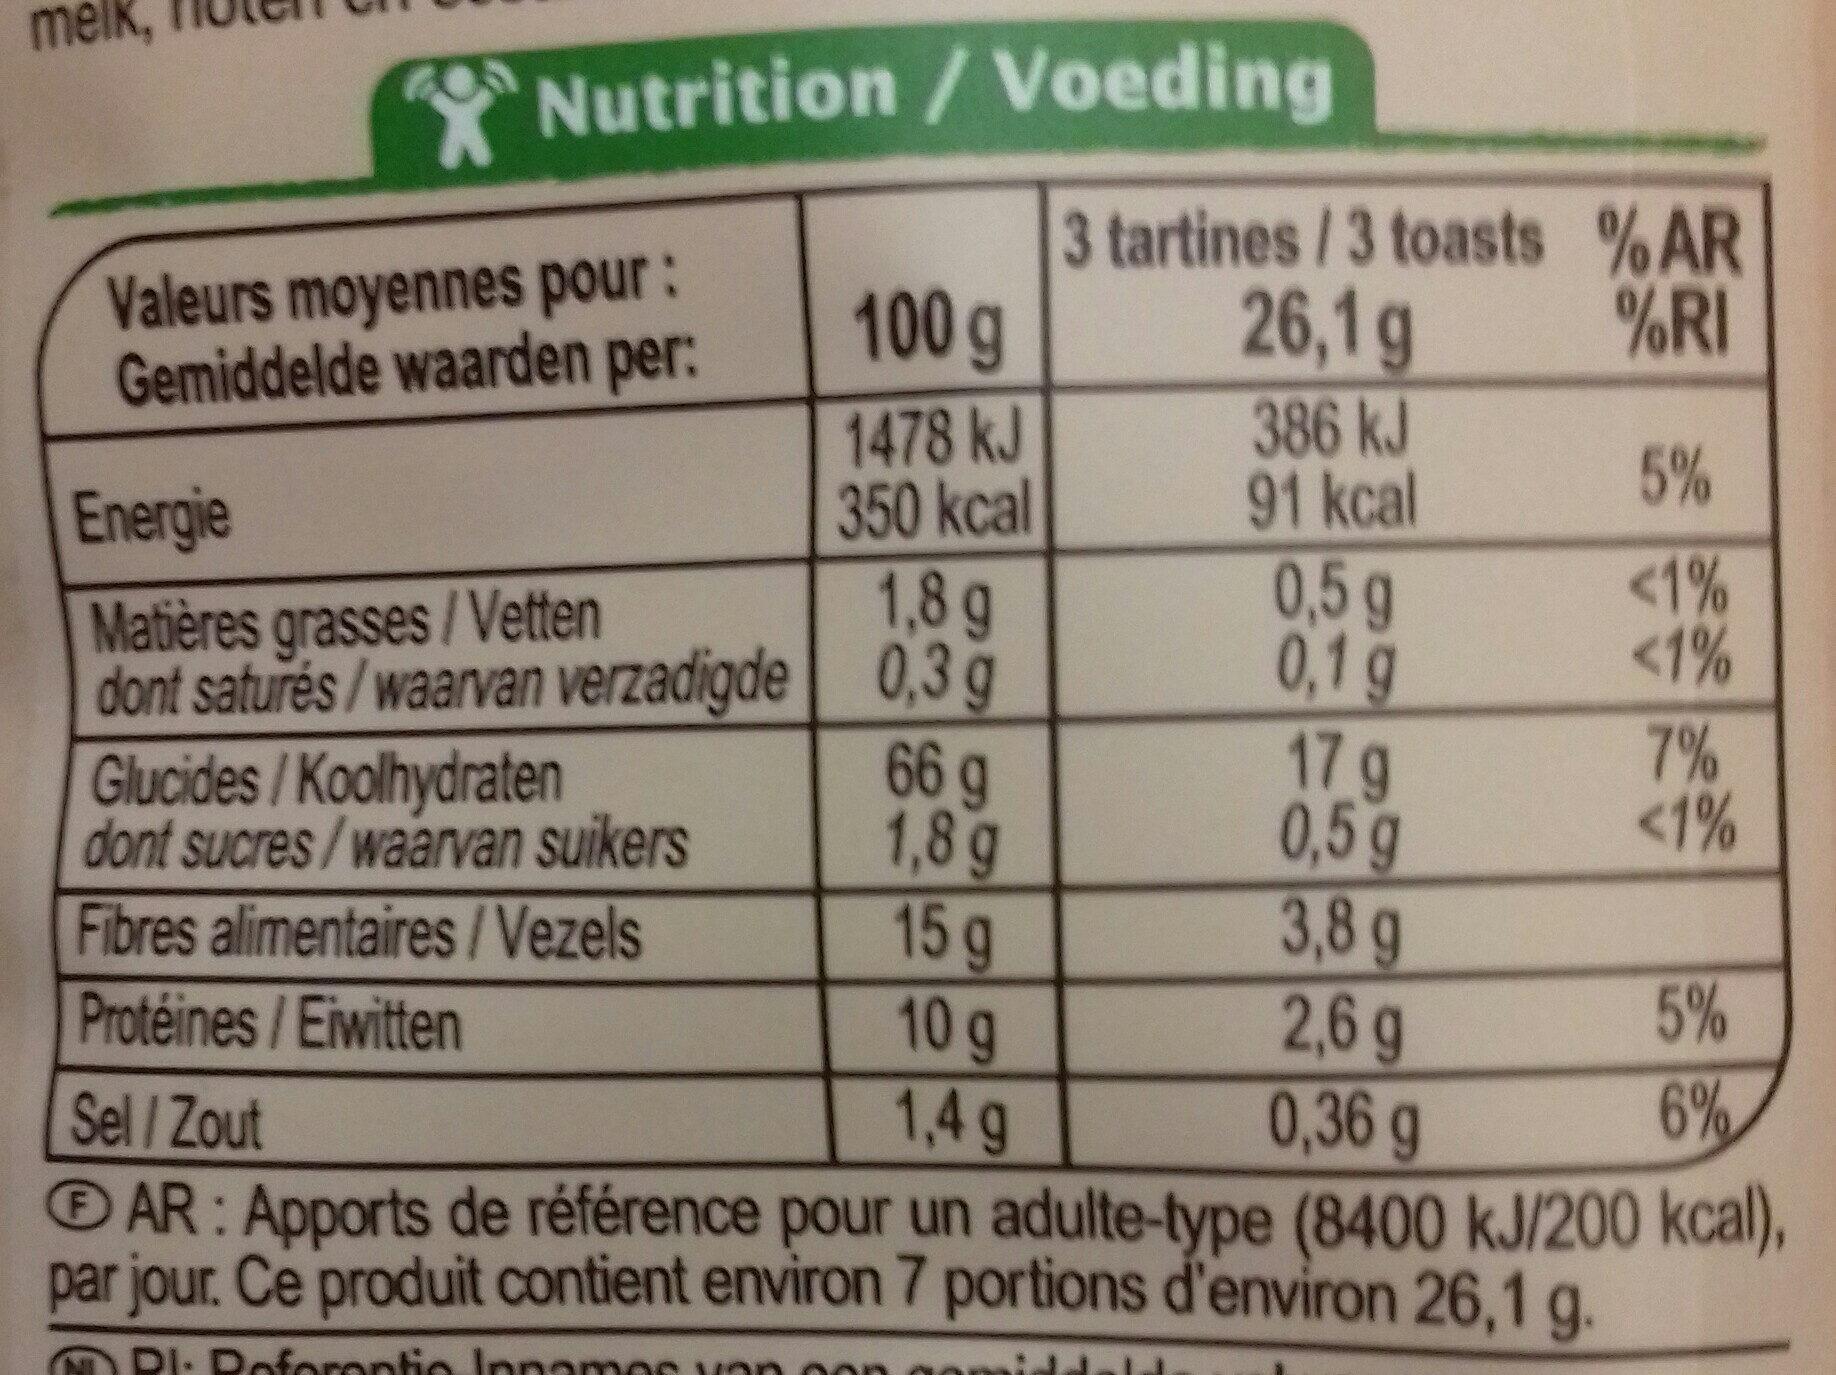 Tartines croustillantes au Seigle - Nutrition facts - fr